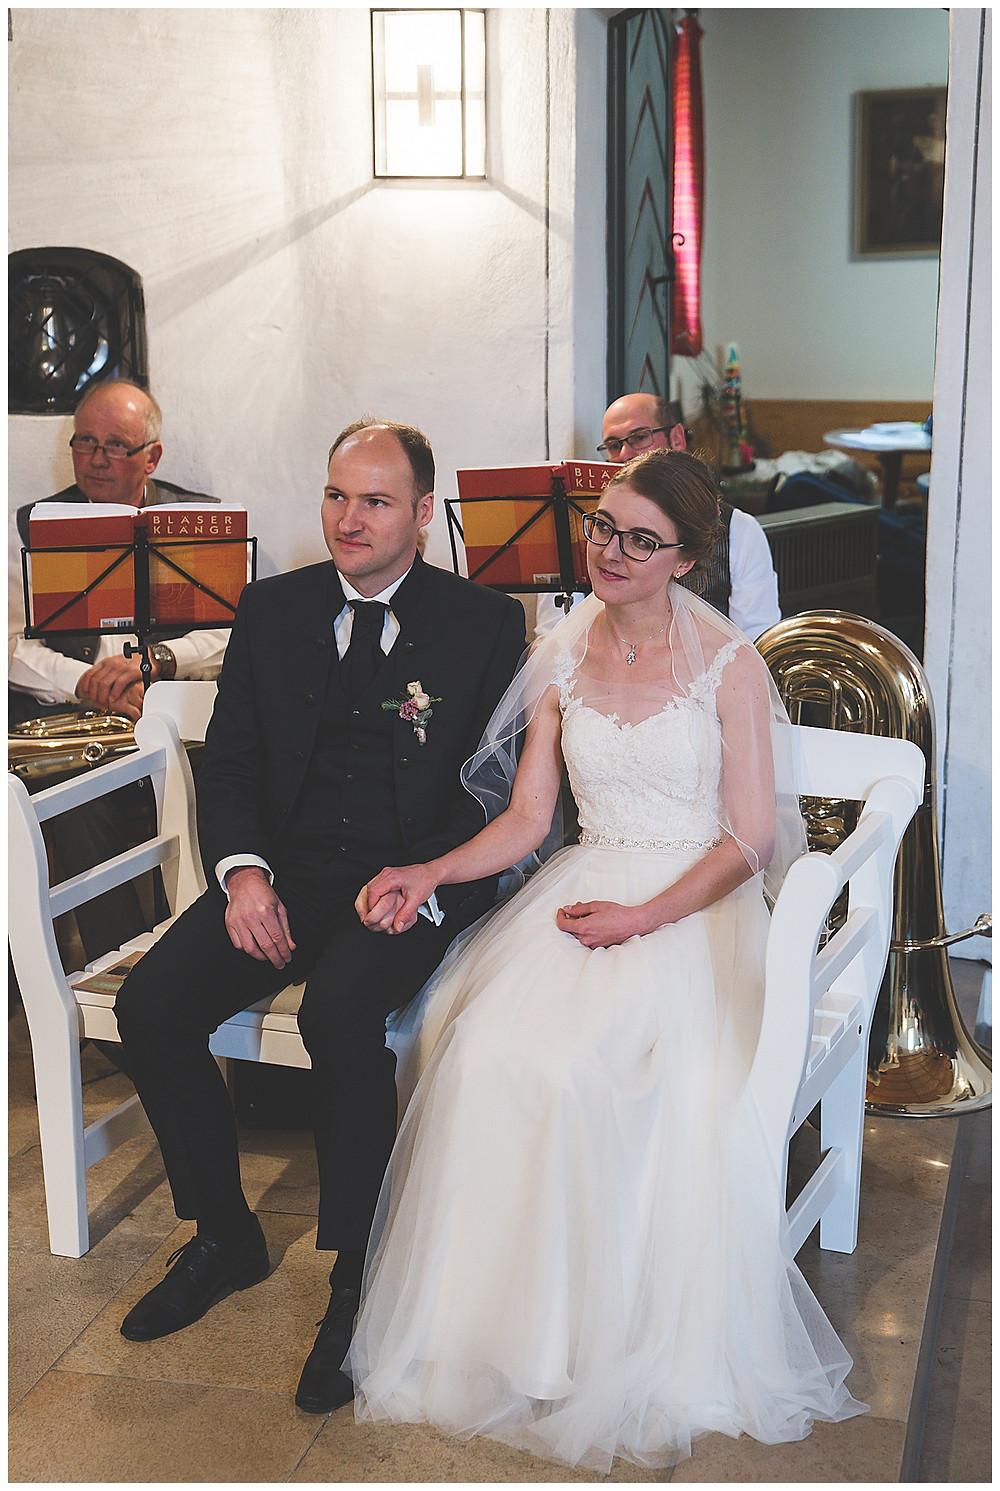 Brautpaar hält Händchen in Kirche